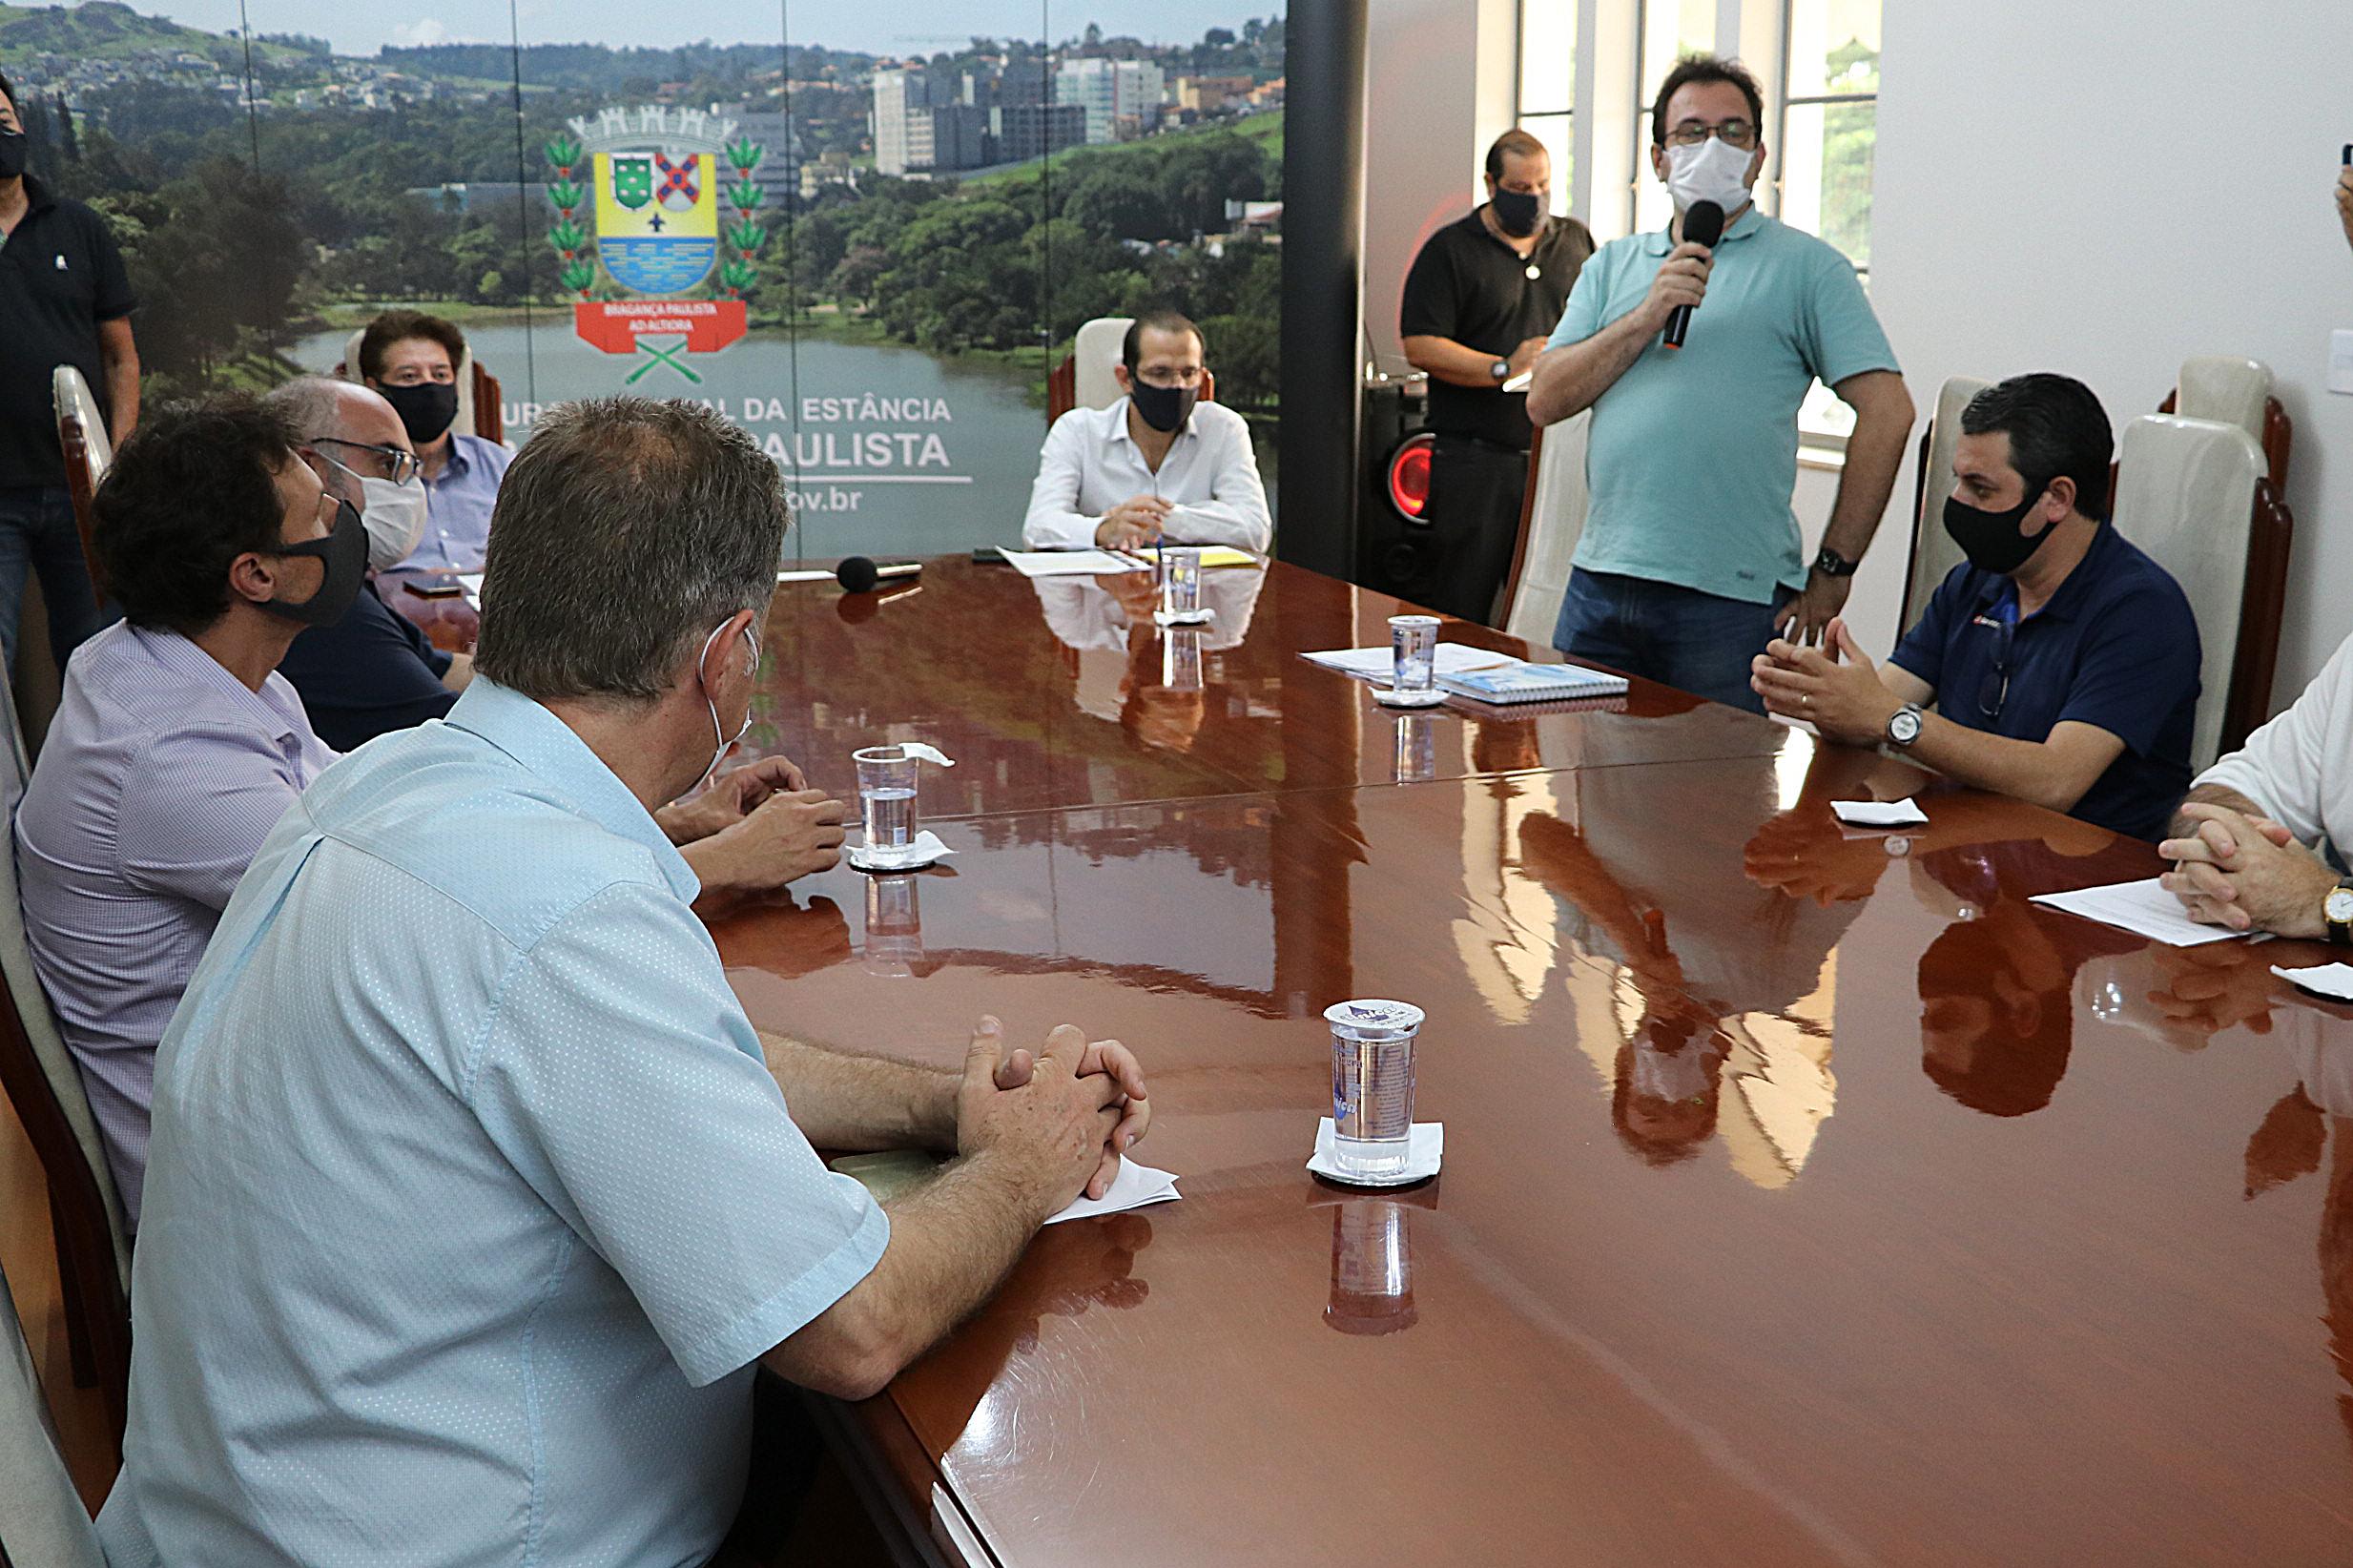 14.09.2020 Assinatura de Ordem de Servico Reforma do PAT e Grama Sintetica CILES5